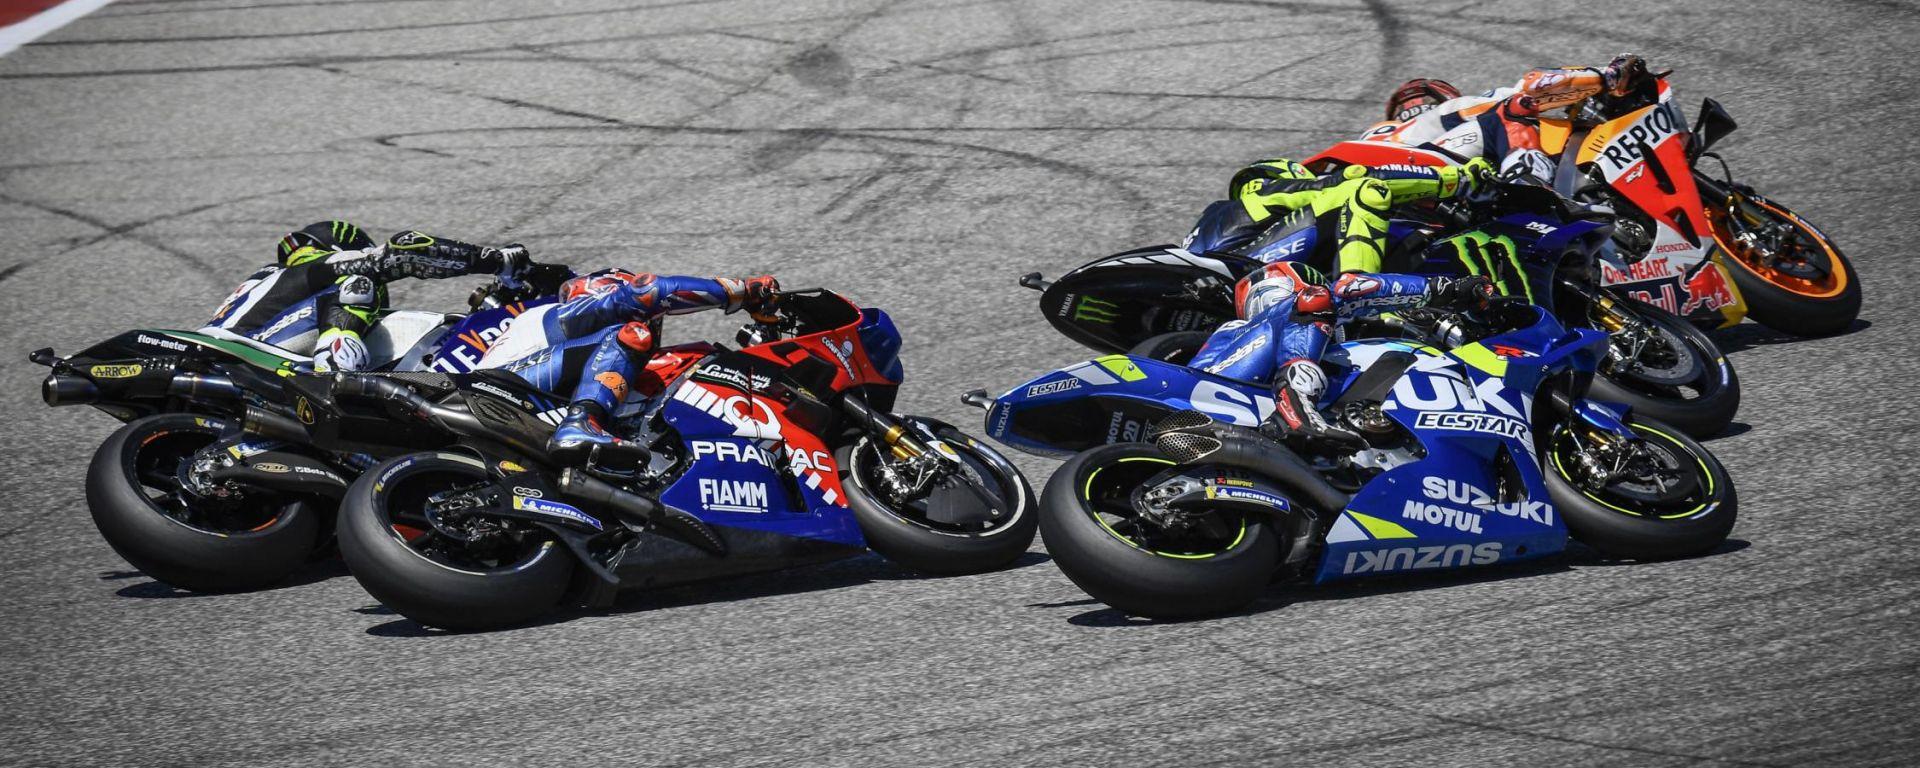 GP Americhe 2019, Crutchlow, Miller, Rins, Rossi e Marquez